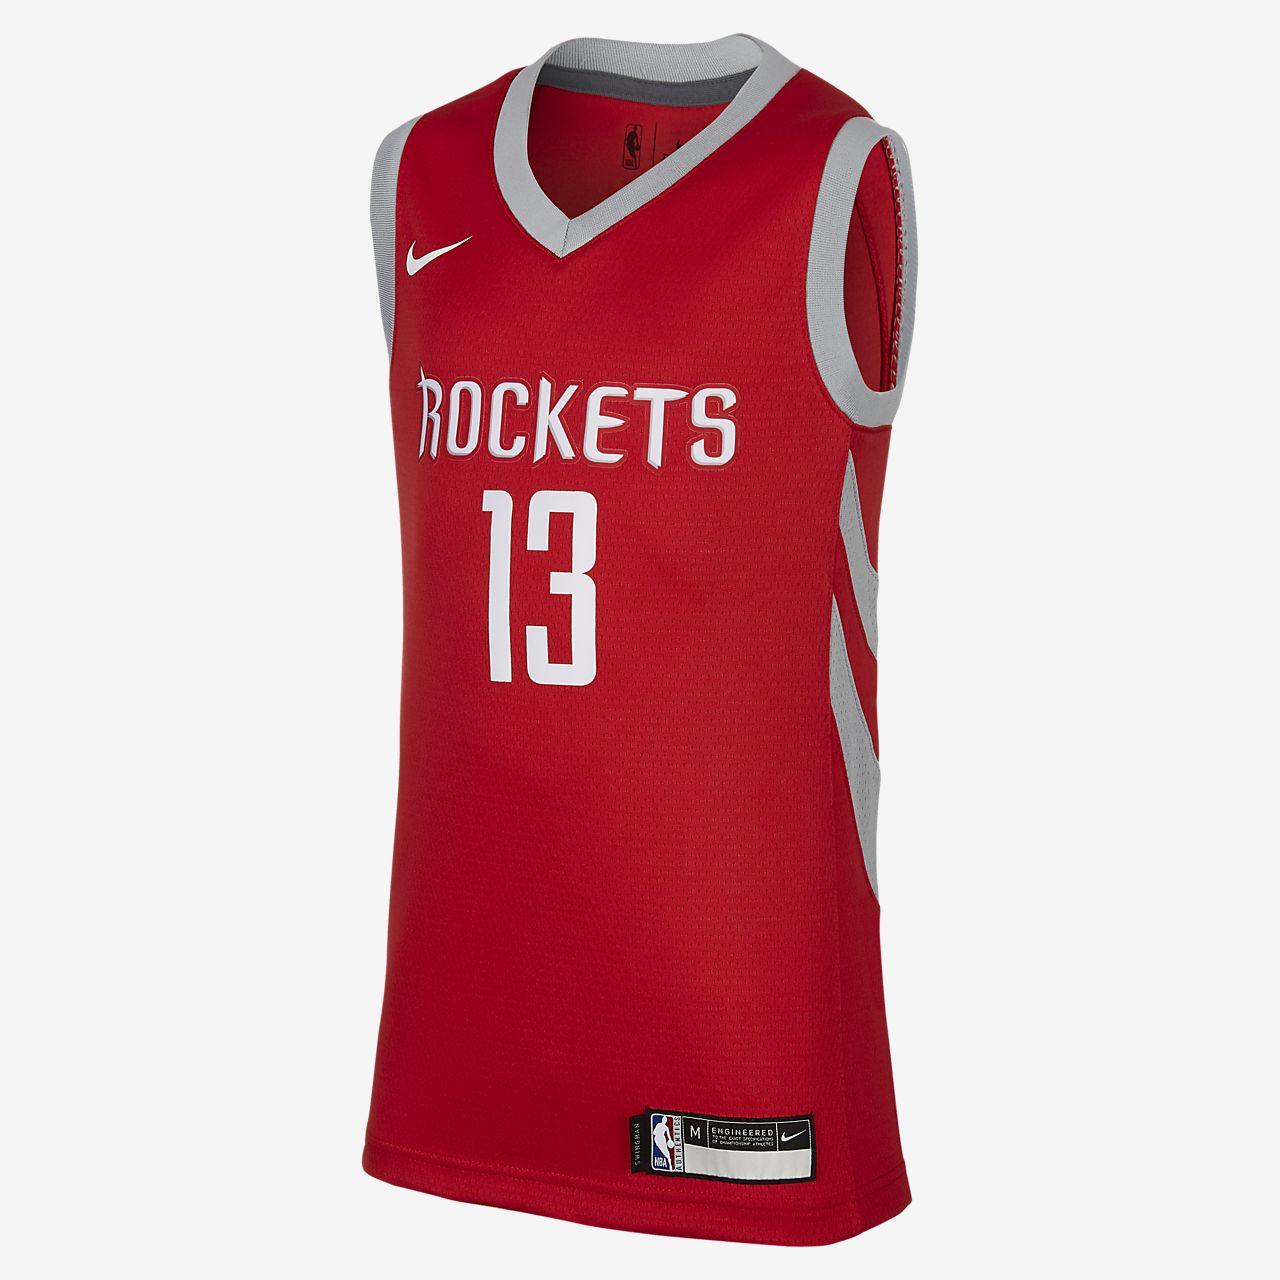 休斯顿火箭队 Icon Edition SwingmanNike NBA Jersey大童 (男孩)球衣